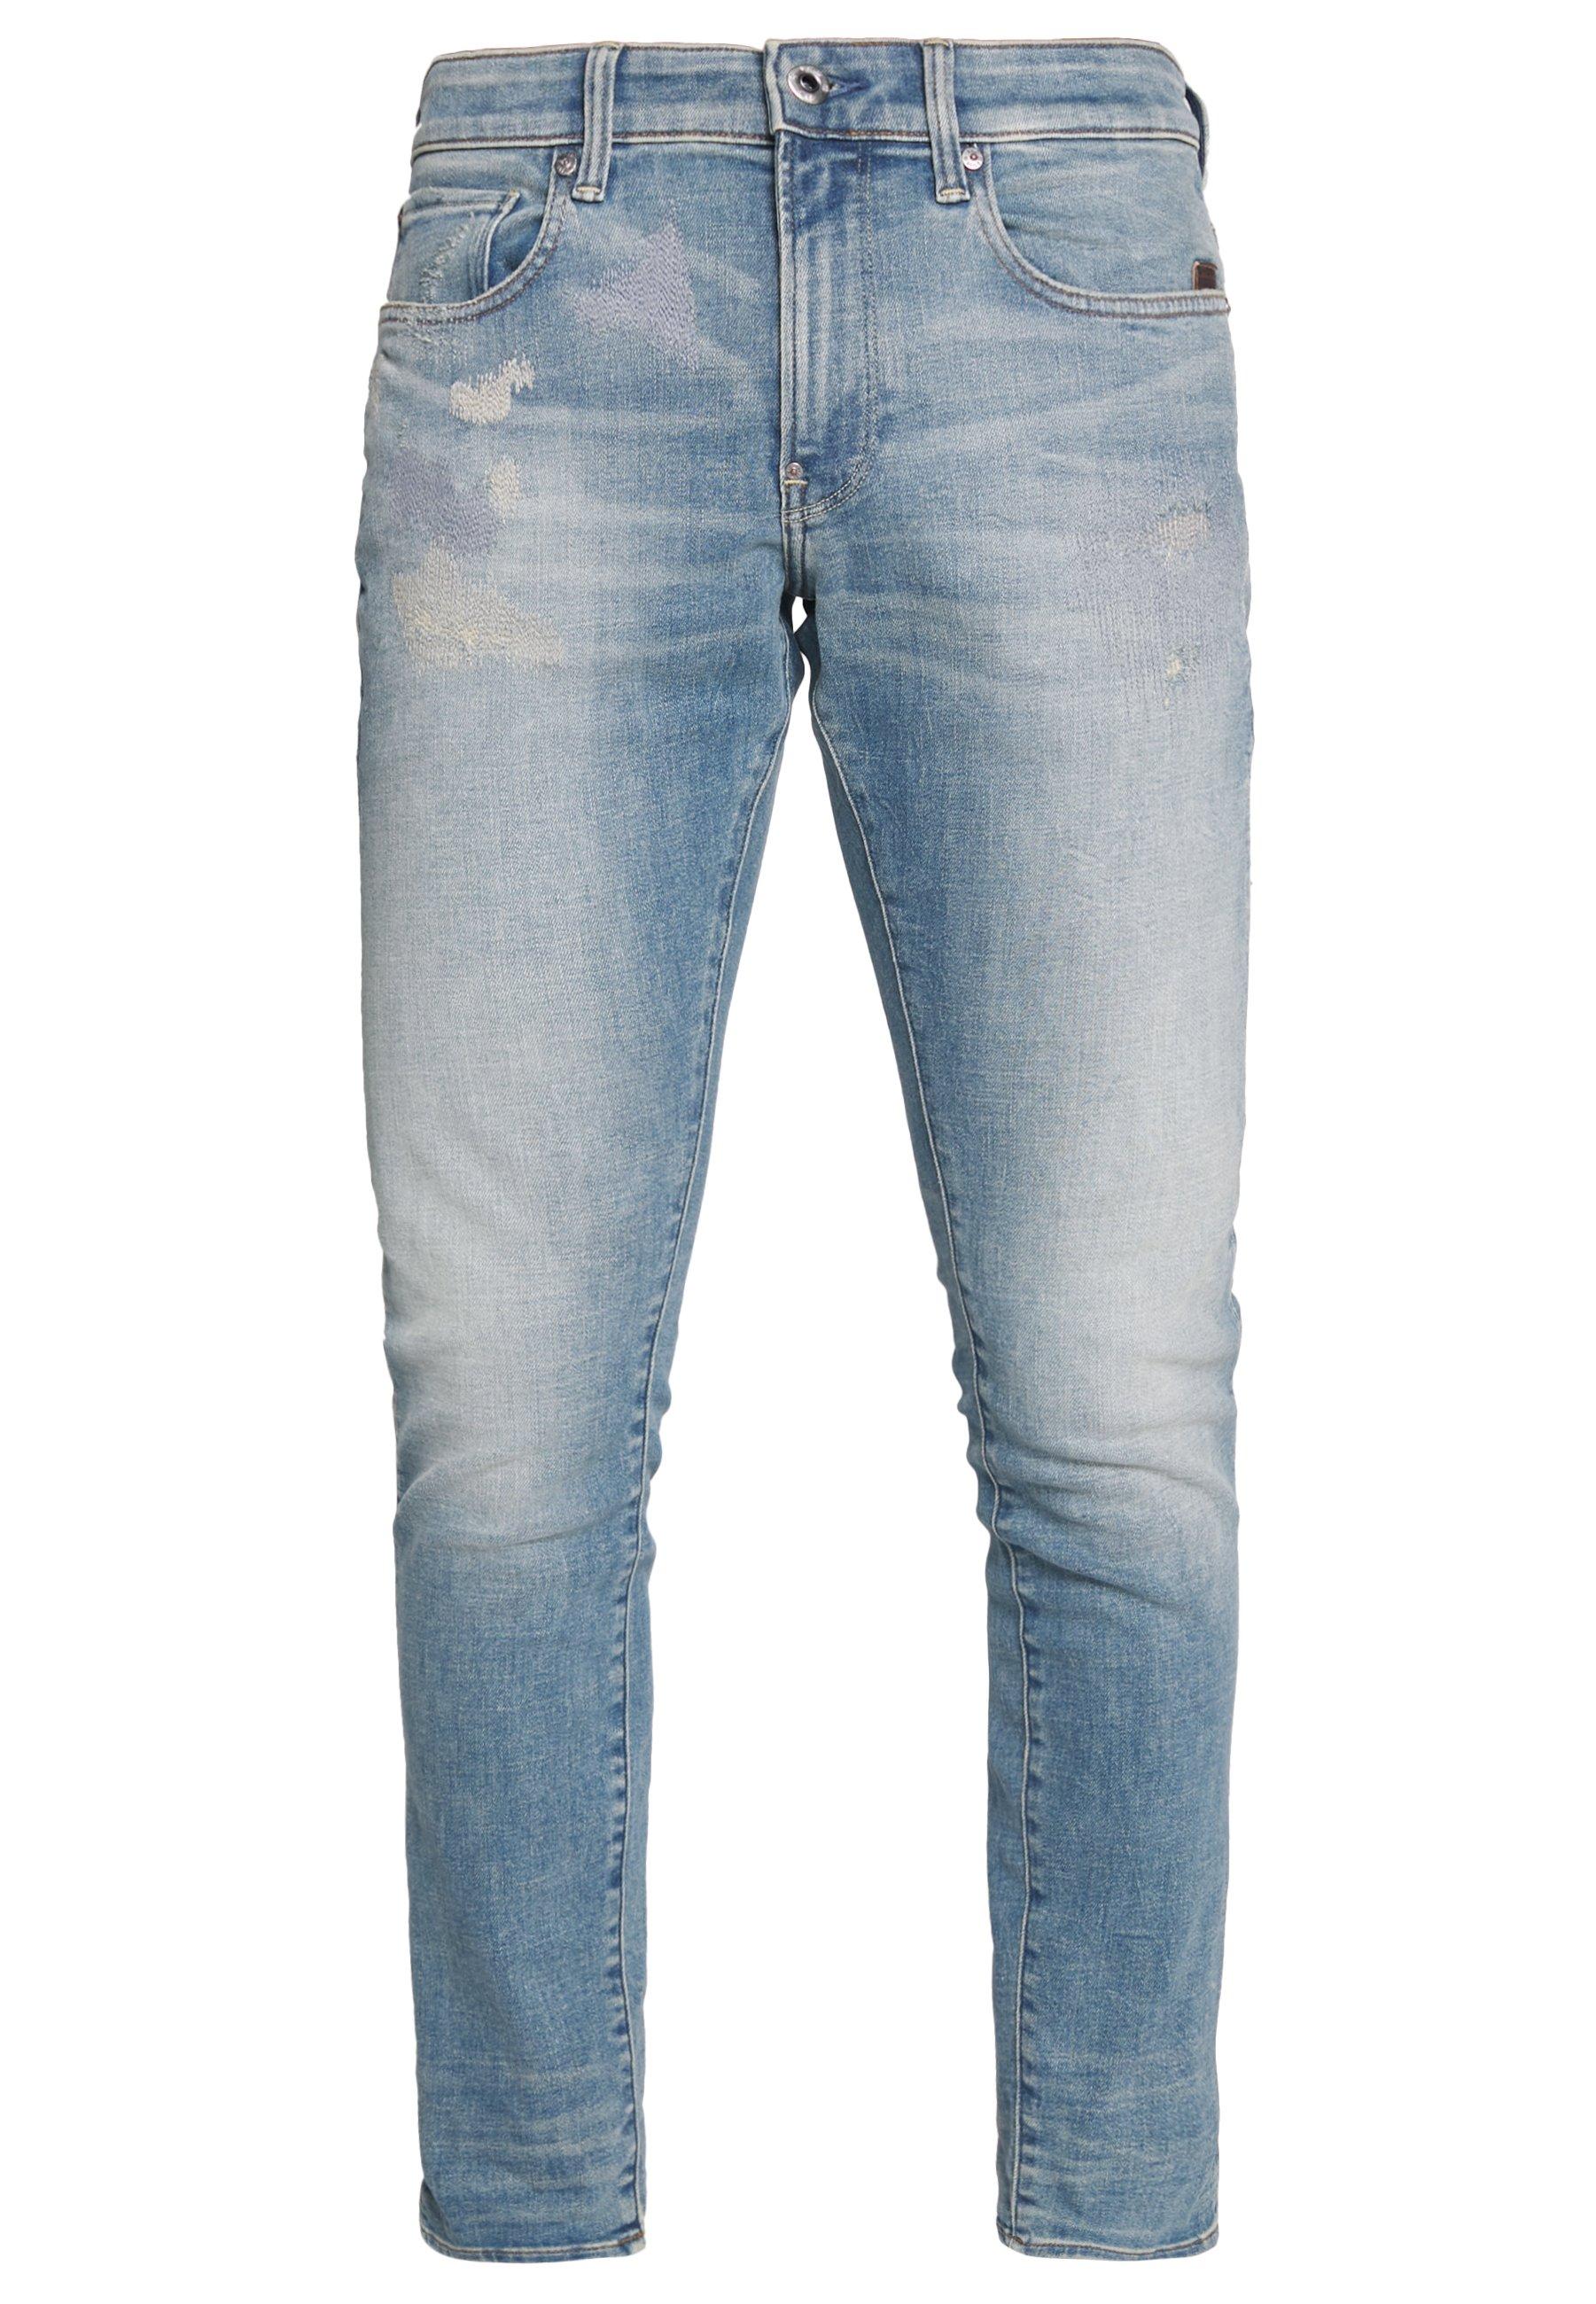 REVEND SKINNY Jeans Skinny Fit heavy elto pure vintage carolina blue restored